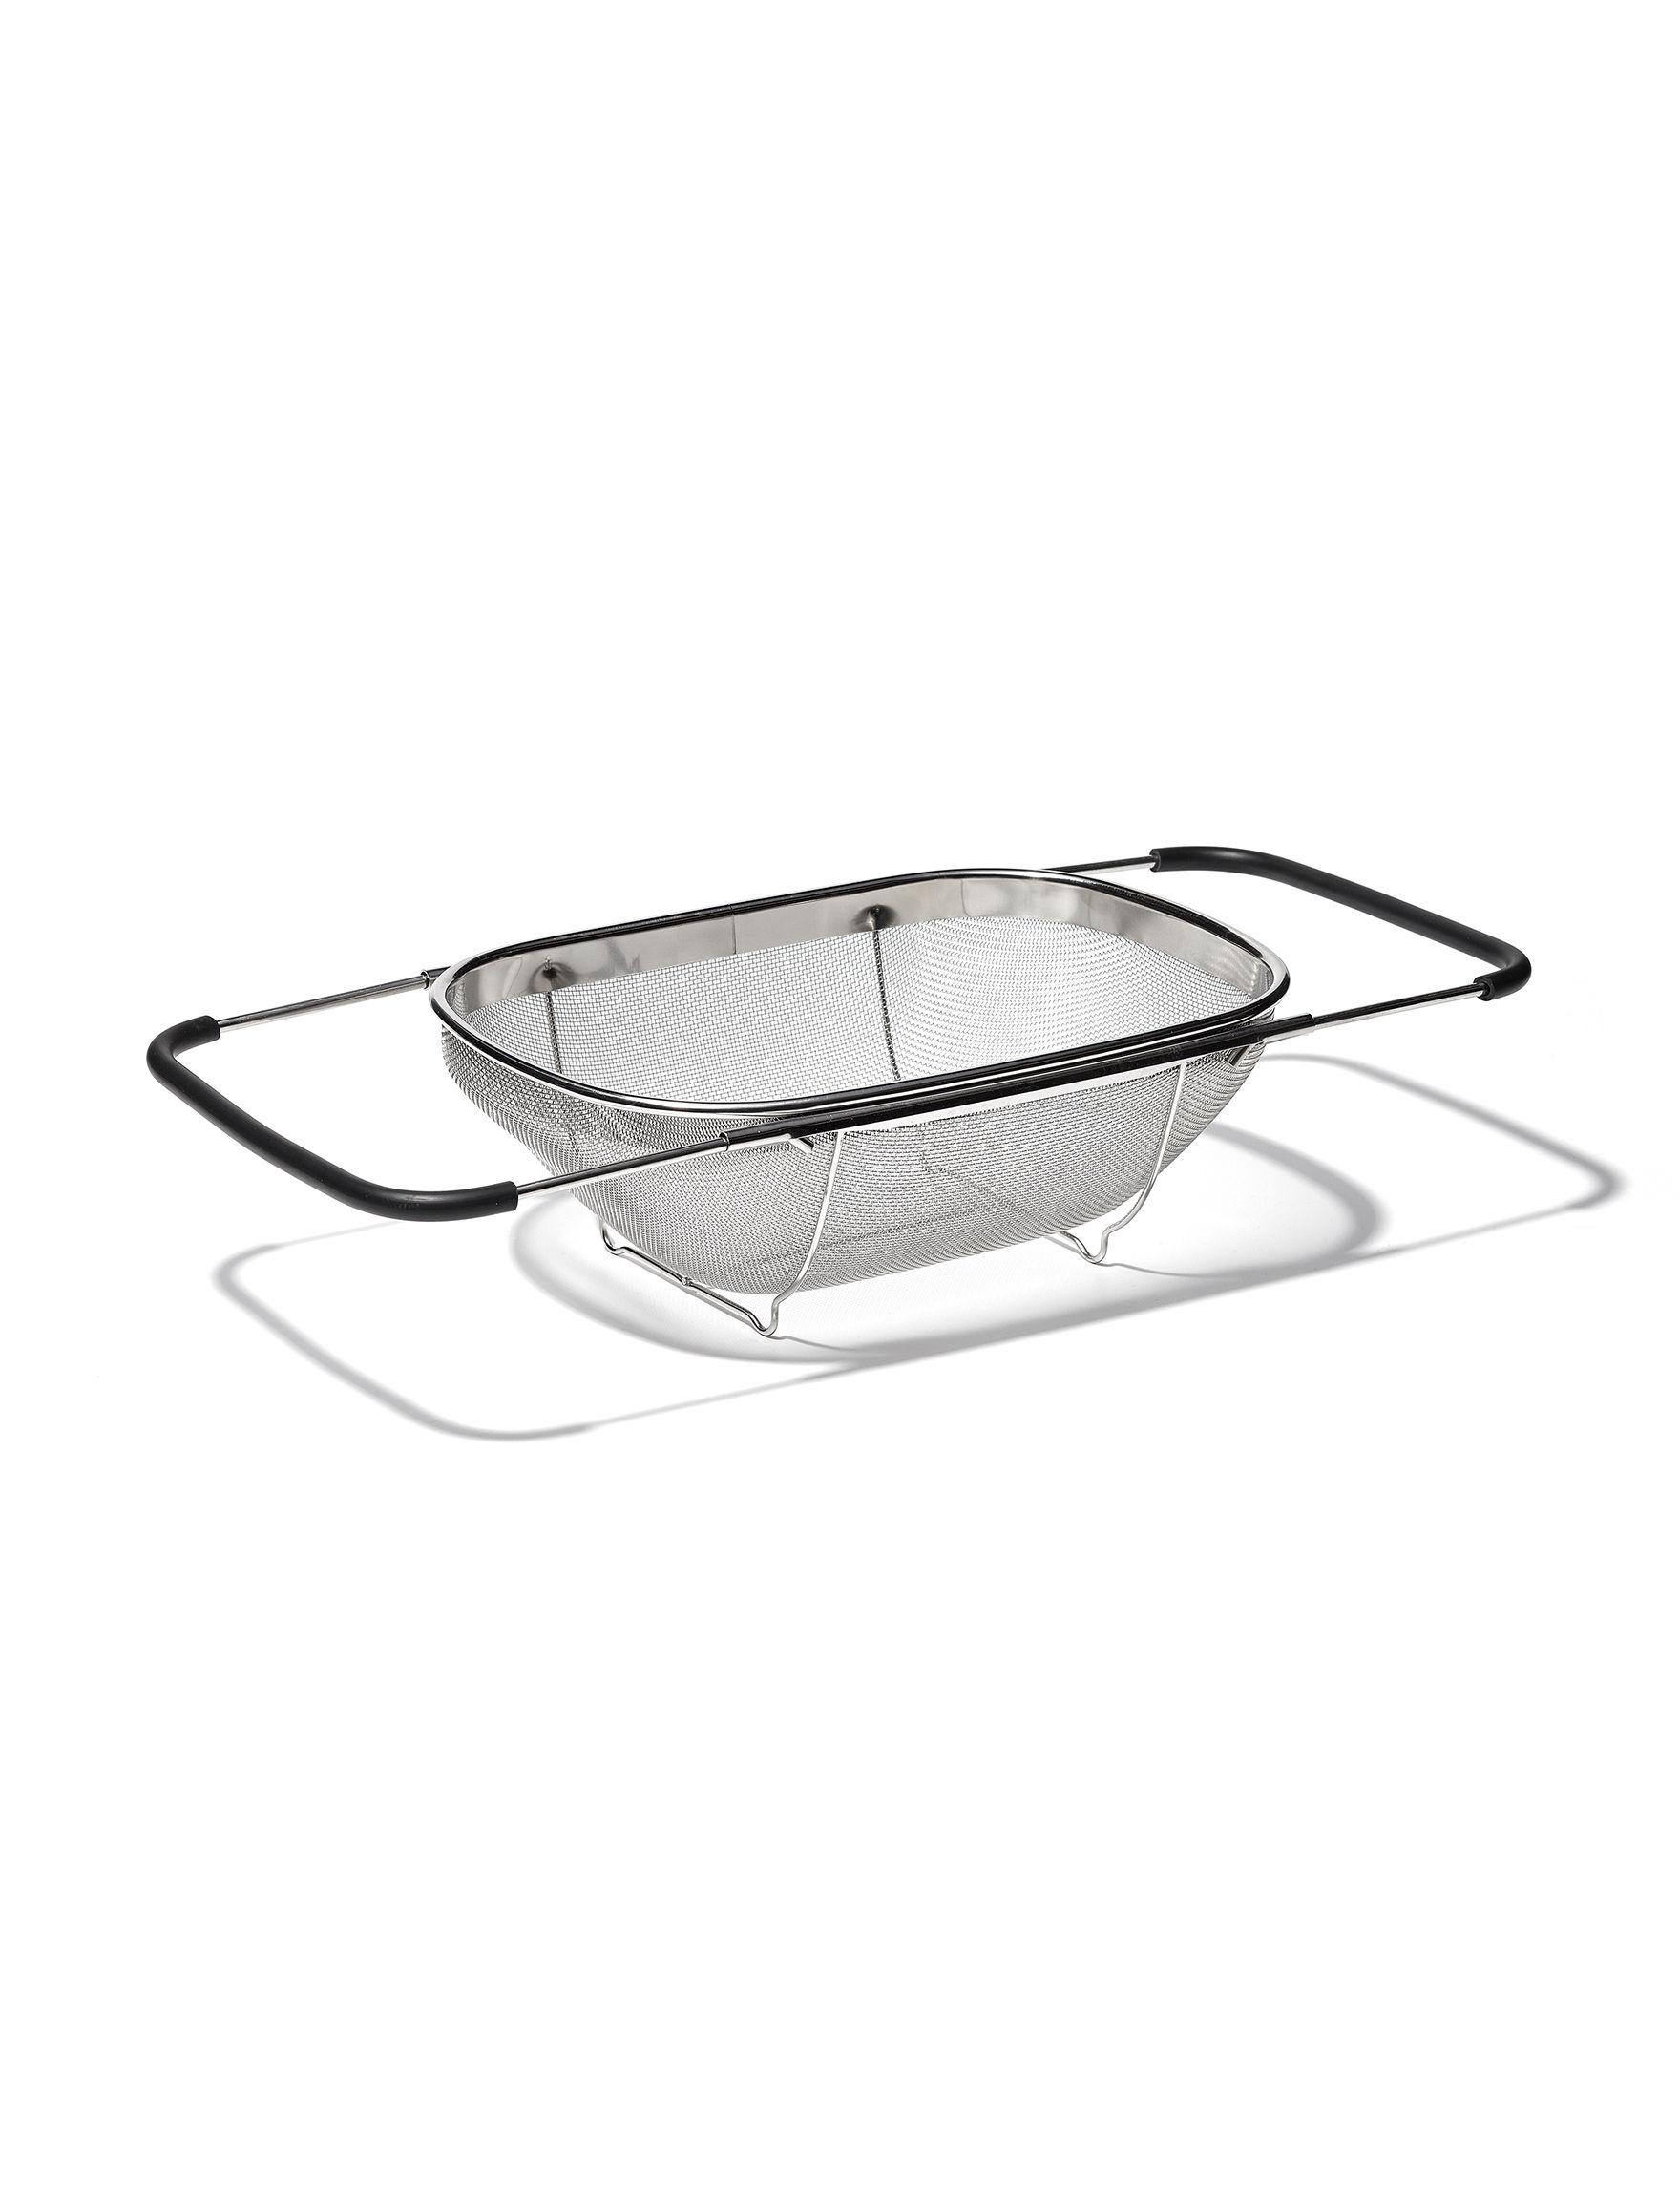 Nu Steel Silver Kitchen Utensils Prep & Tools